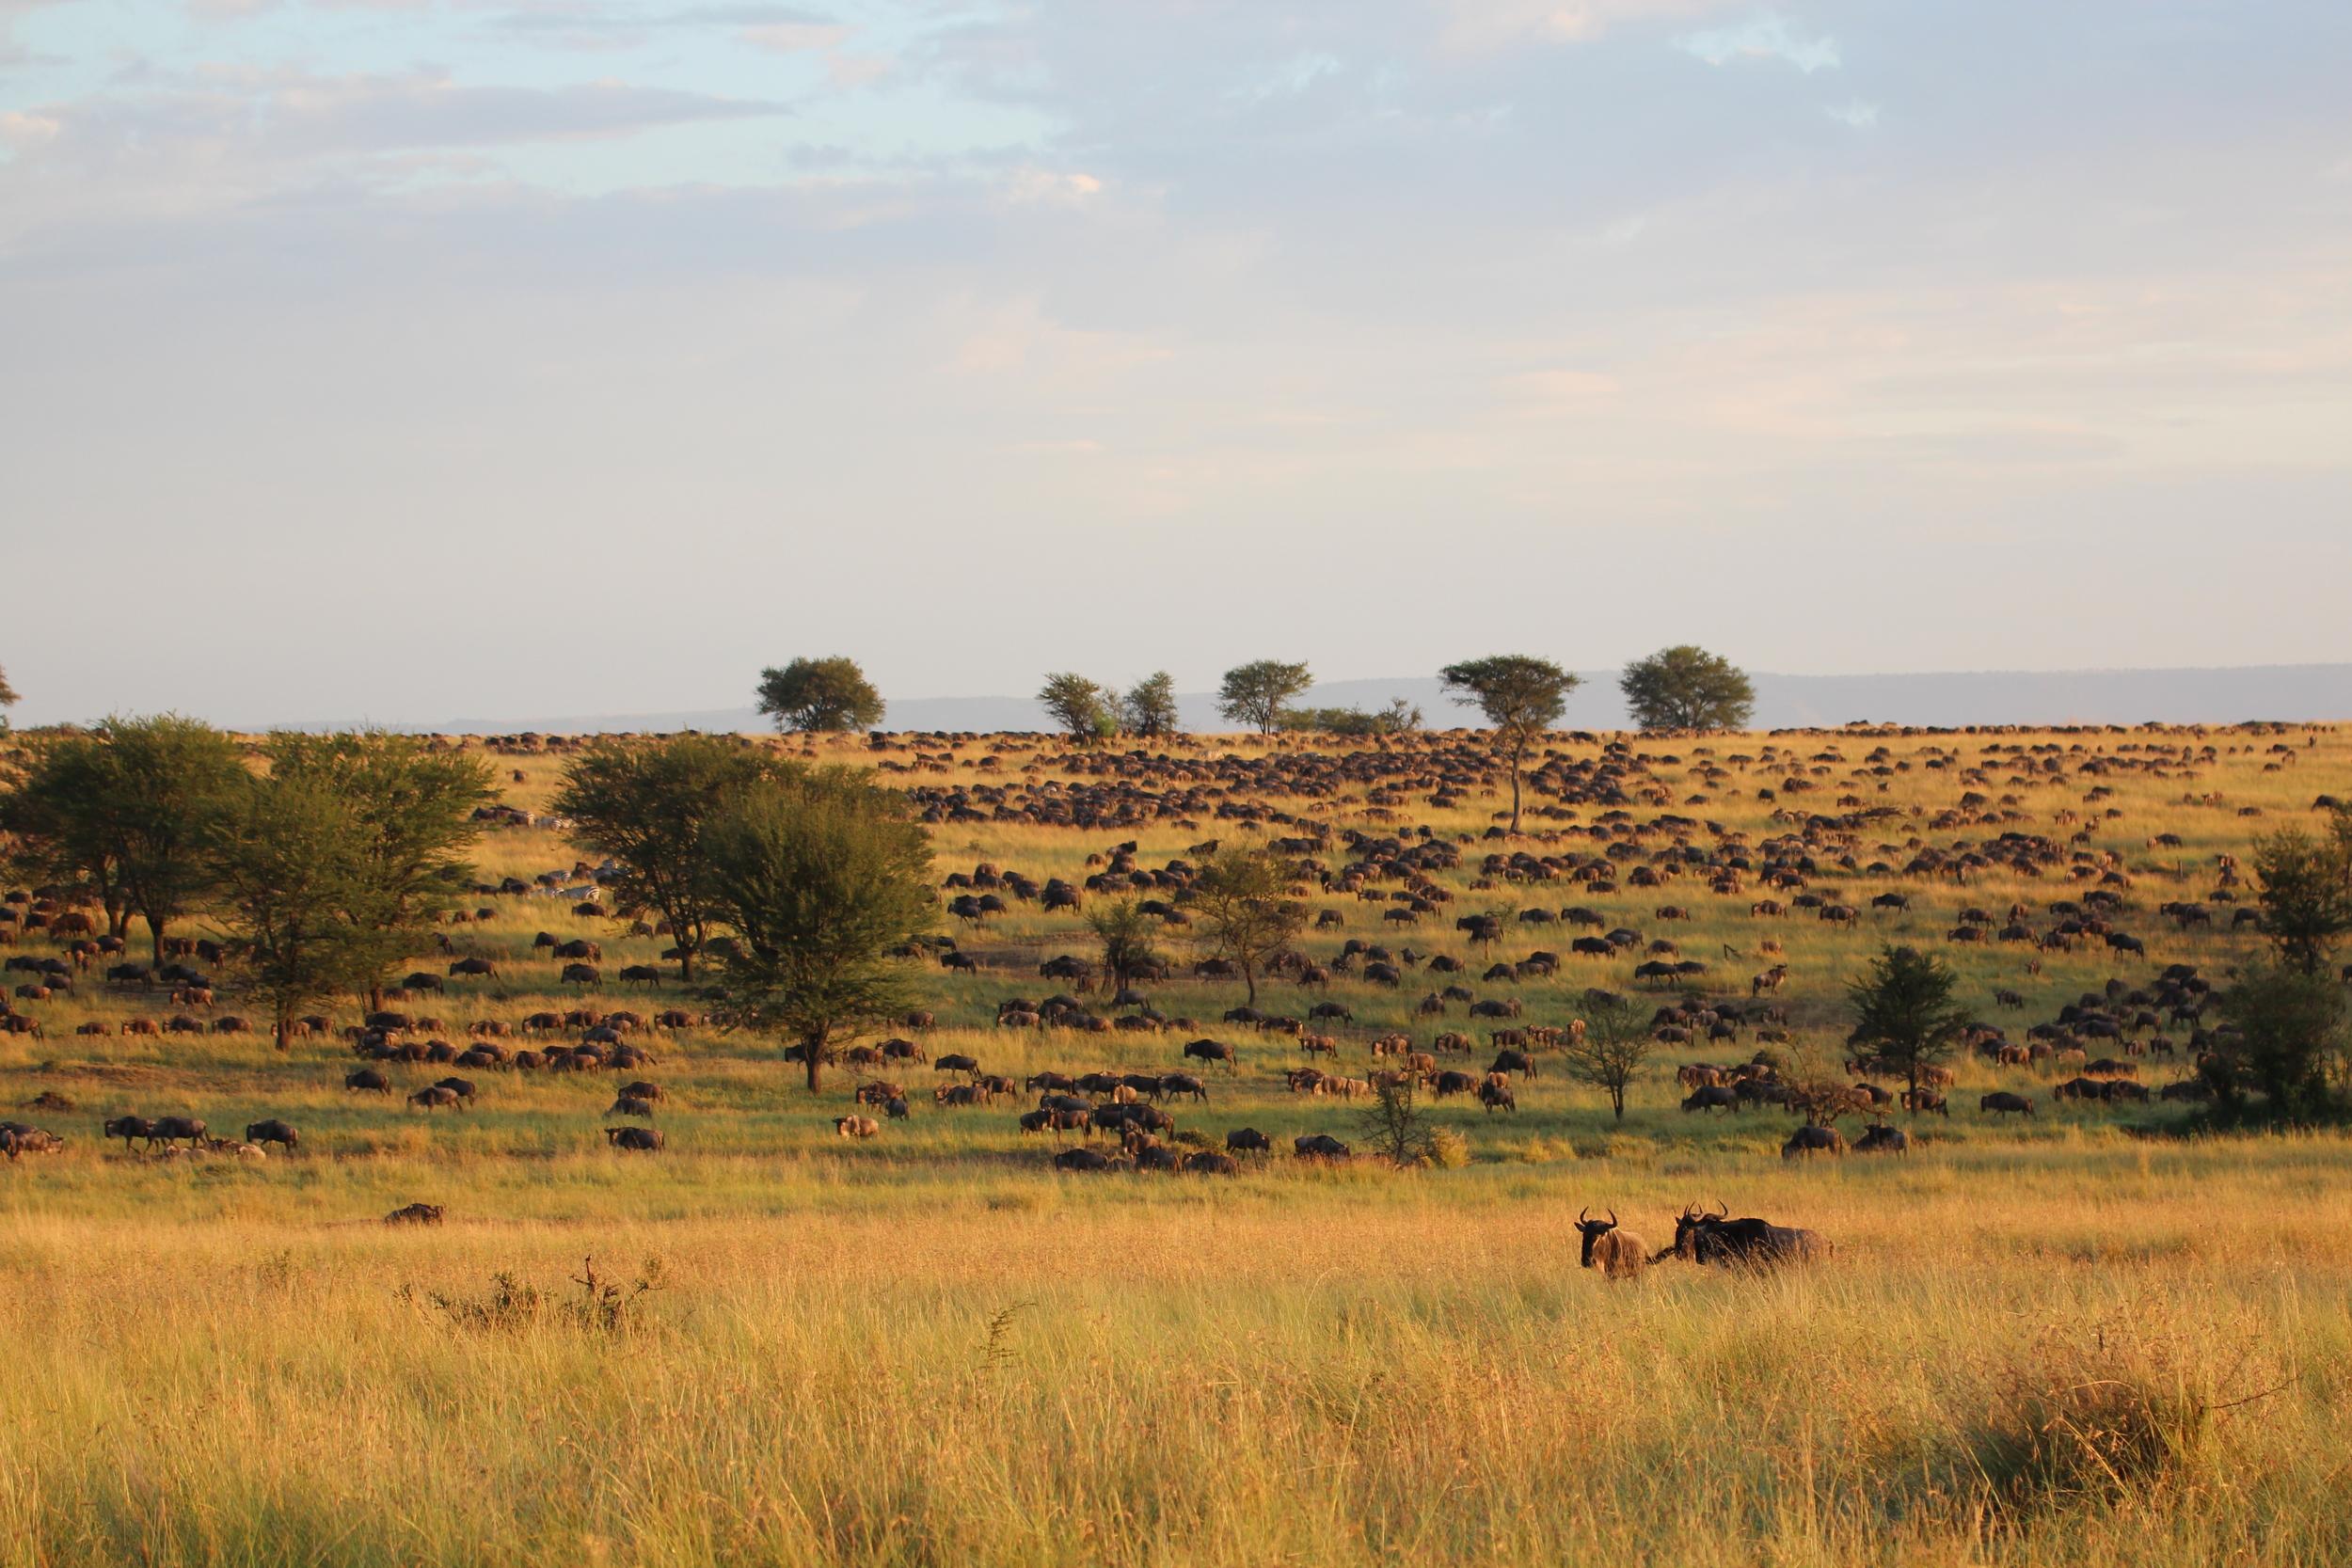 The Wildebeest Migration slow grunting their way to Northern Serengeti.